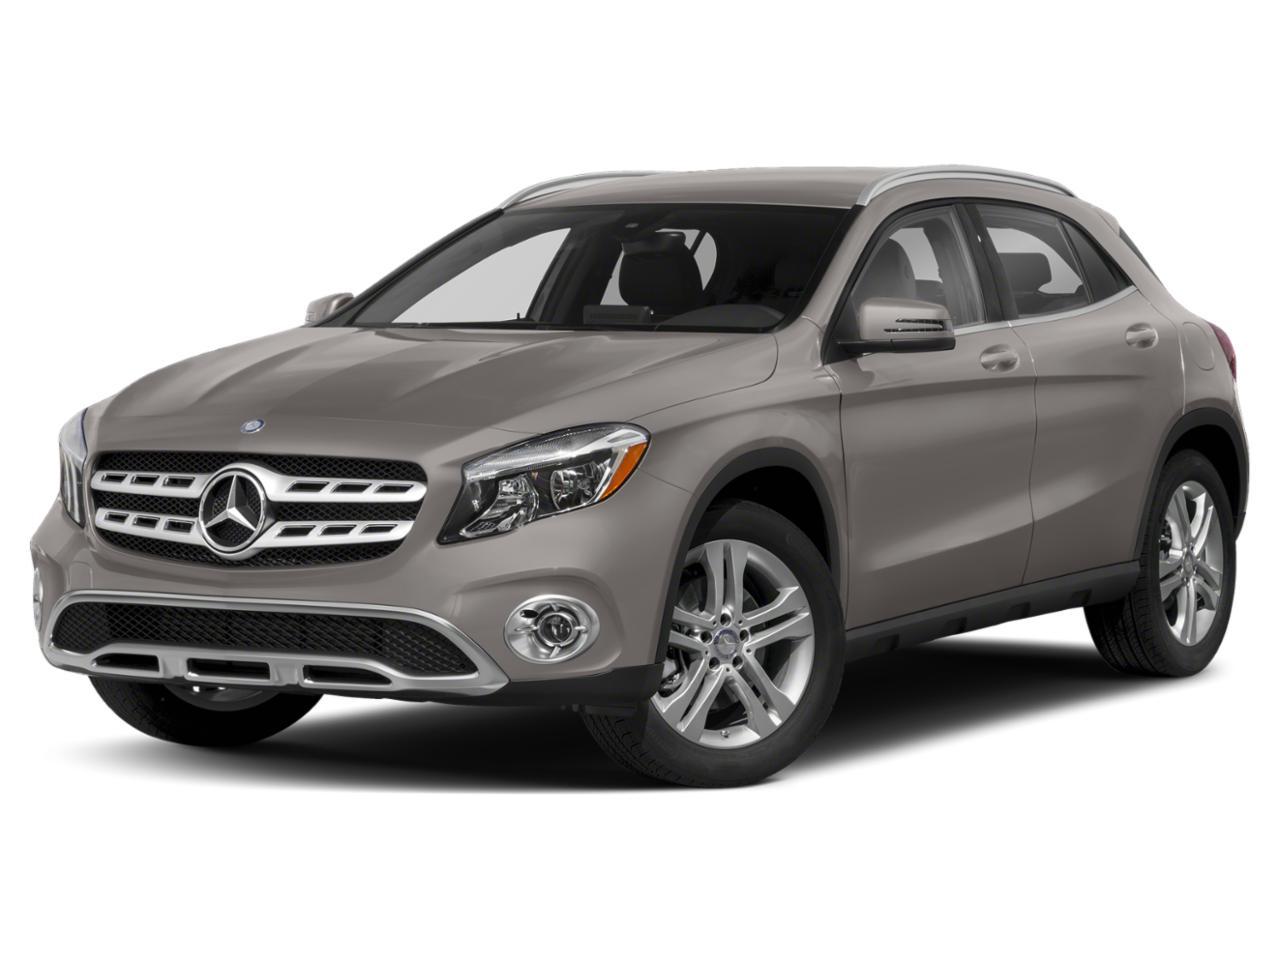 2020 Mercedes-Benz GLA Vehicle Photo in Flemington, NJ 08822